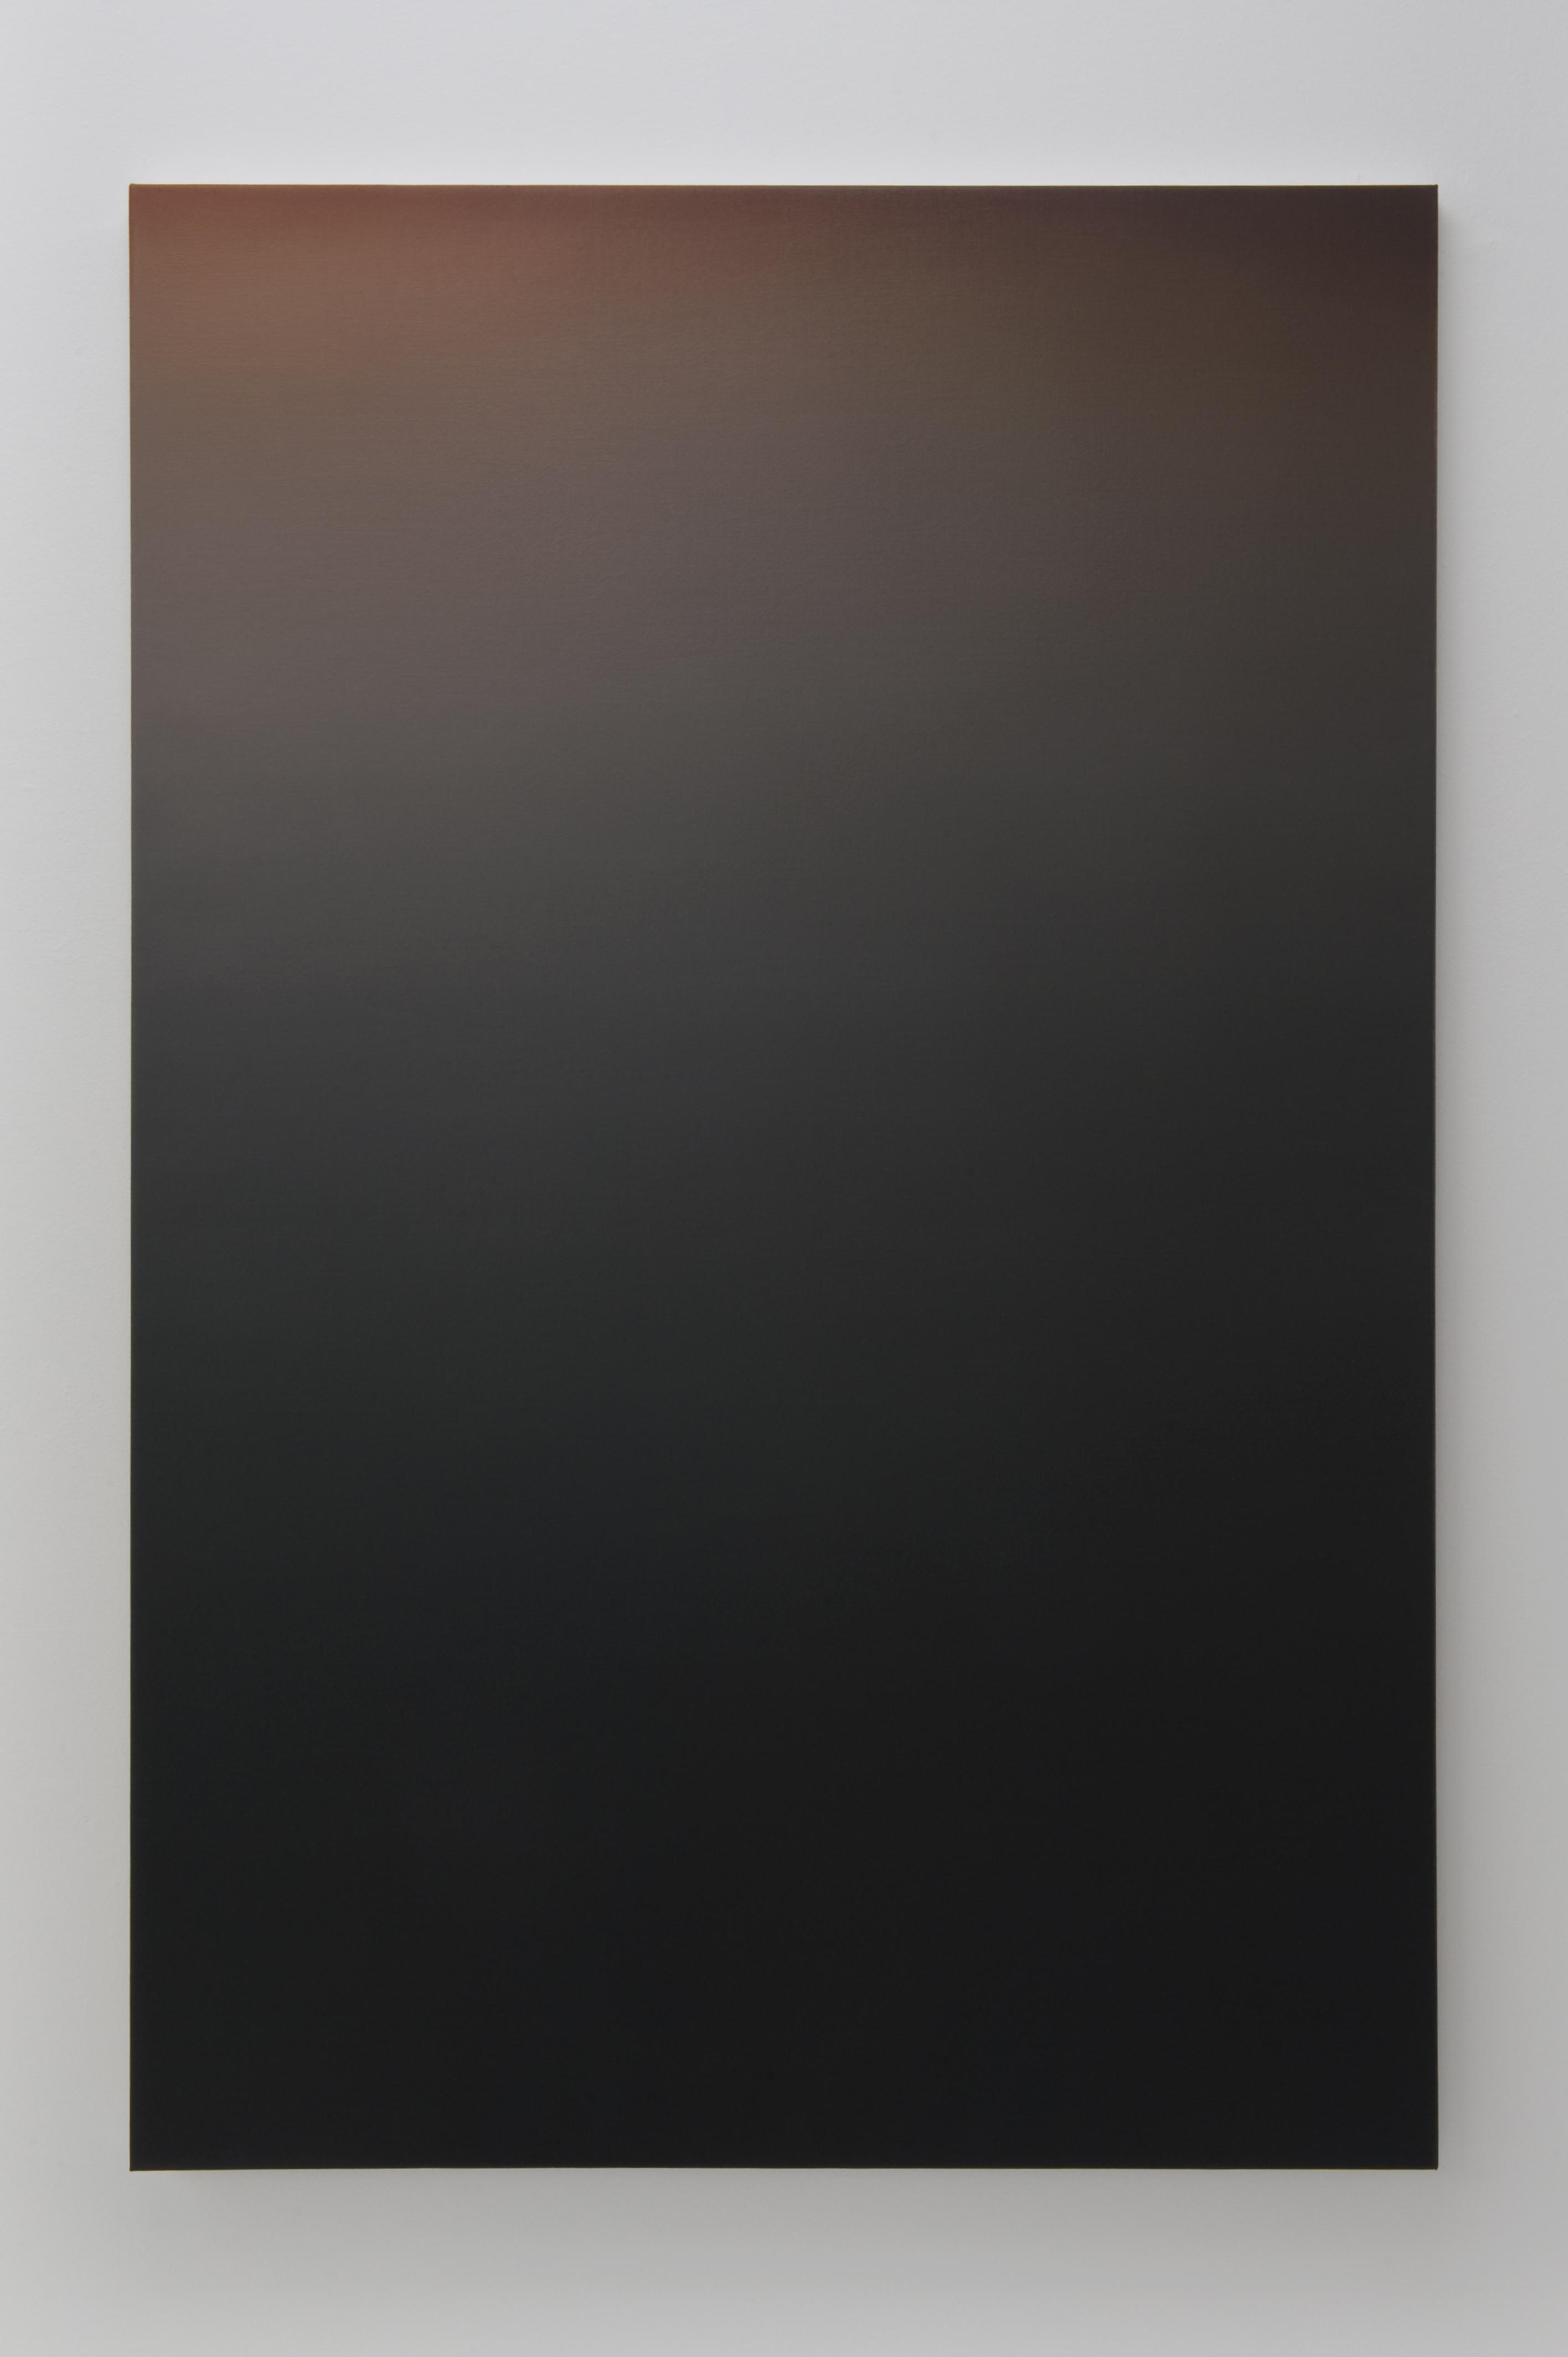 Untitled (Inverse #3), 2009 |  | ProjecteSD